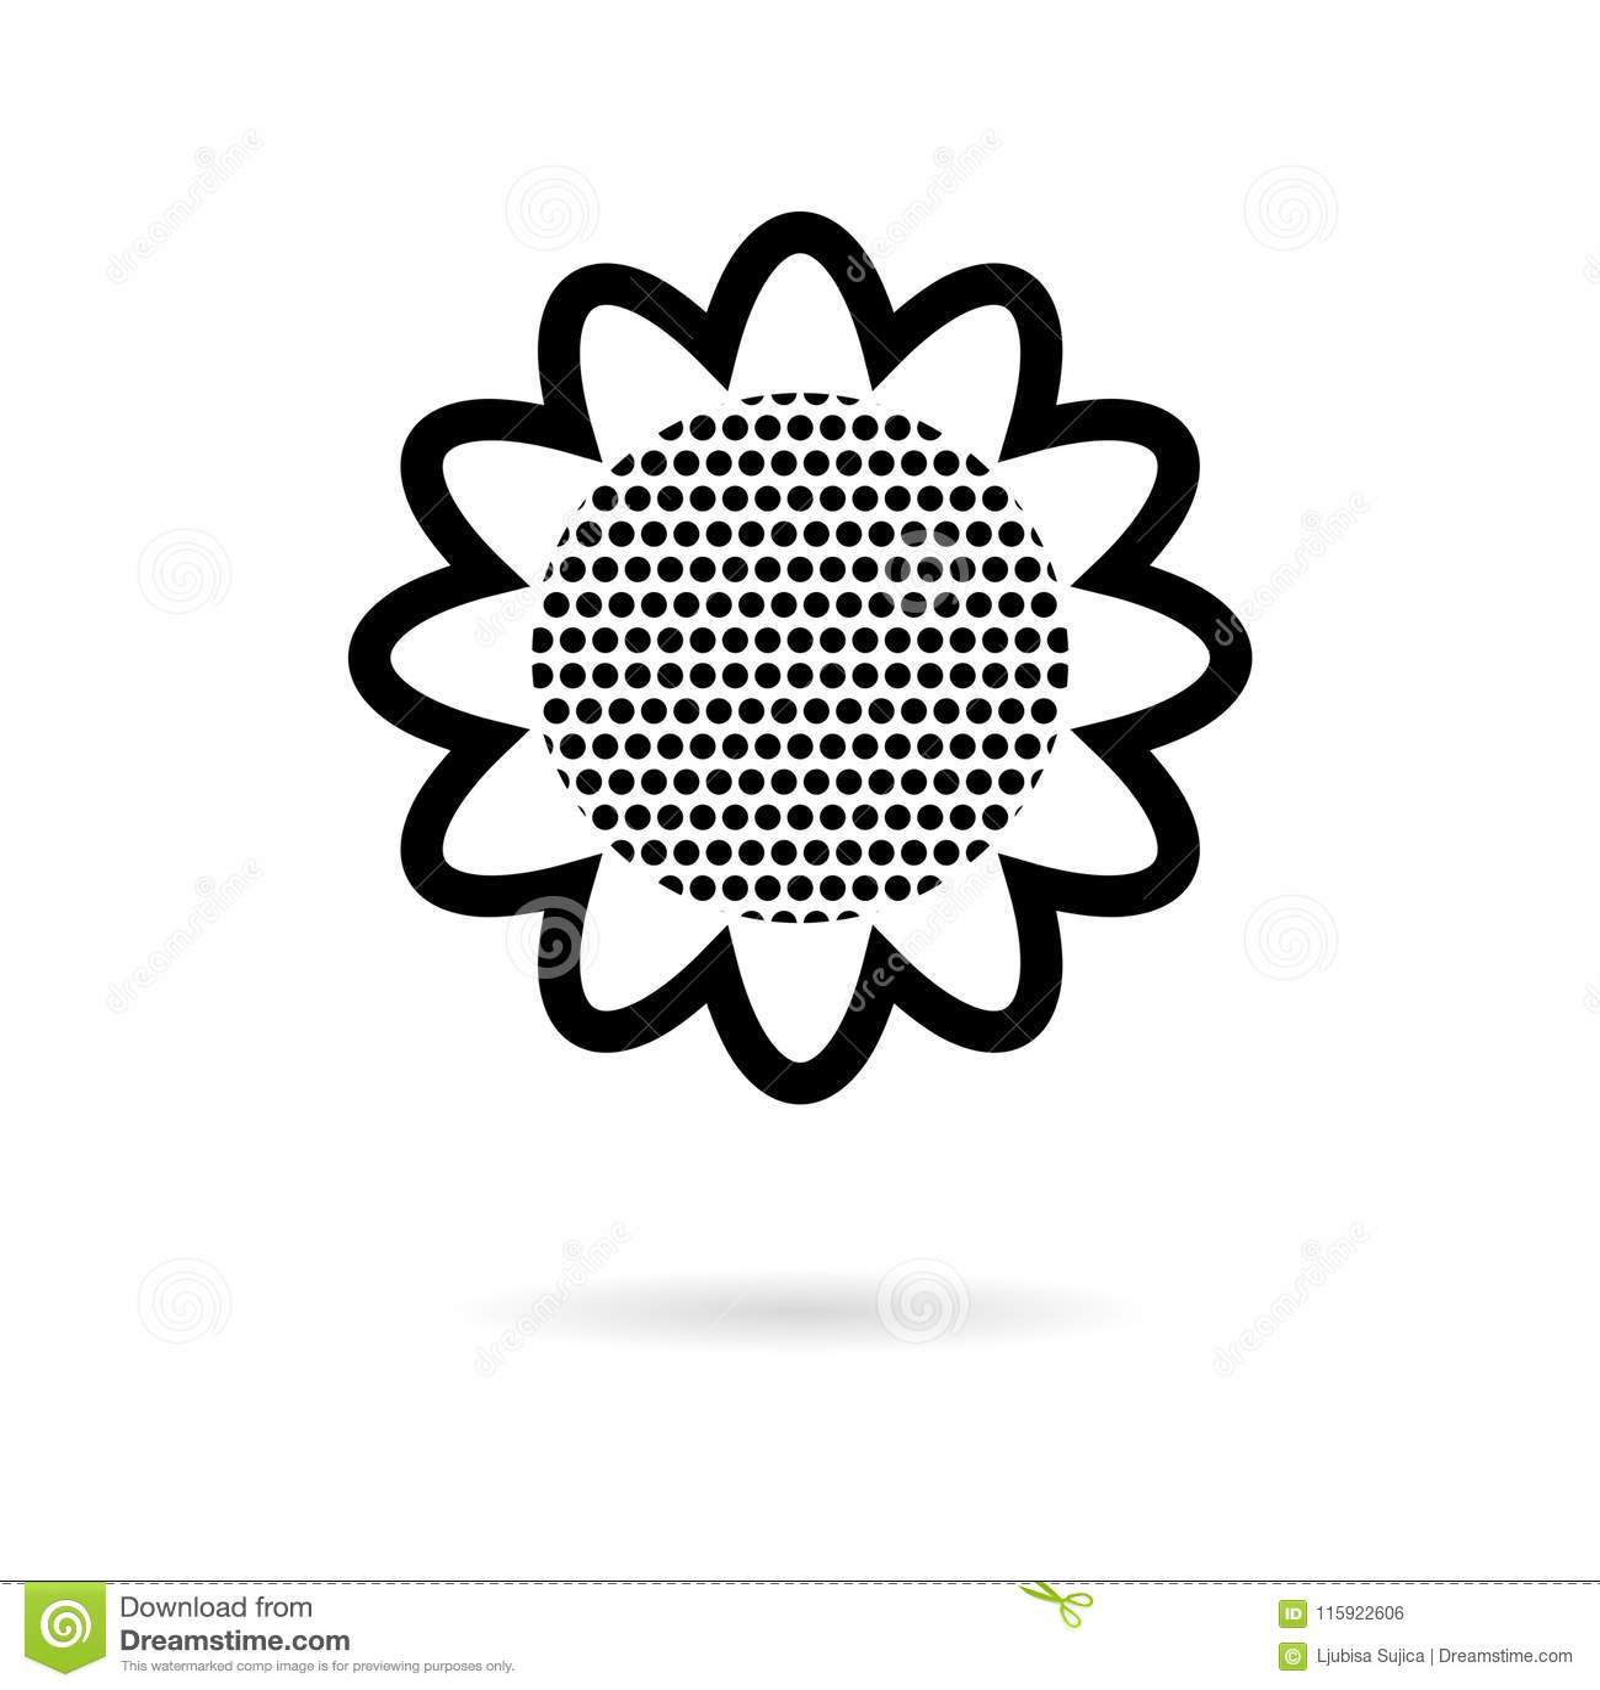 Black Sunflower Symbol Icon Stock Vector Illustration Of Black